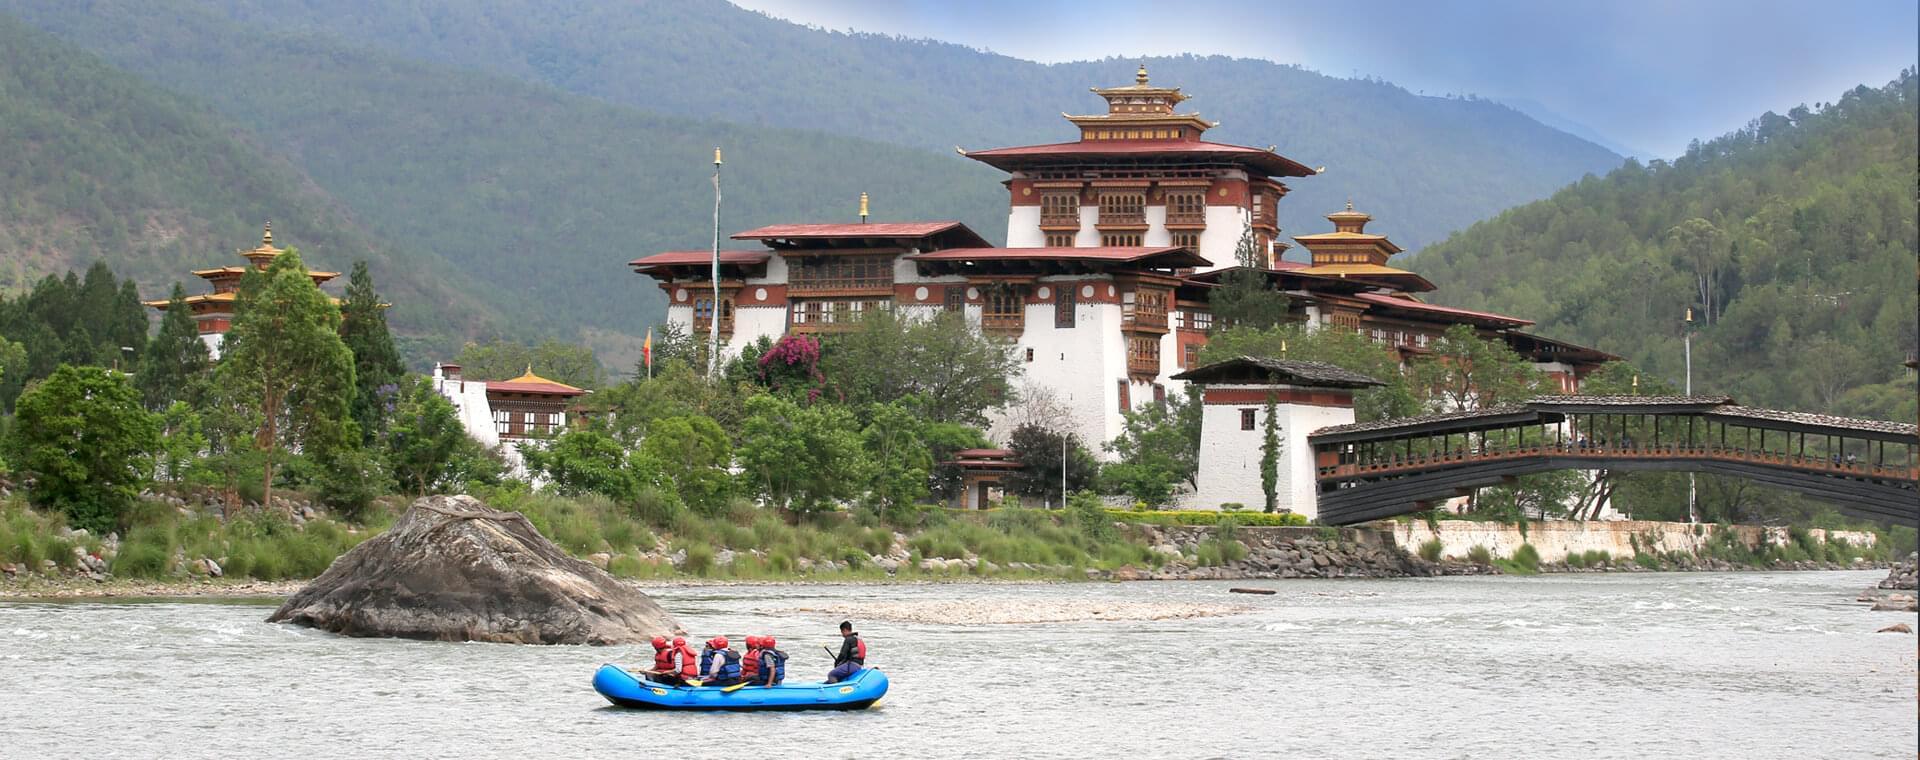 Bhutan Travel Review